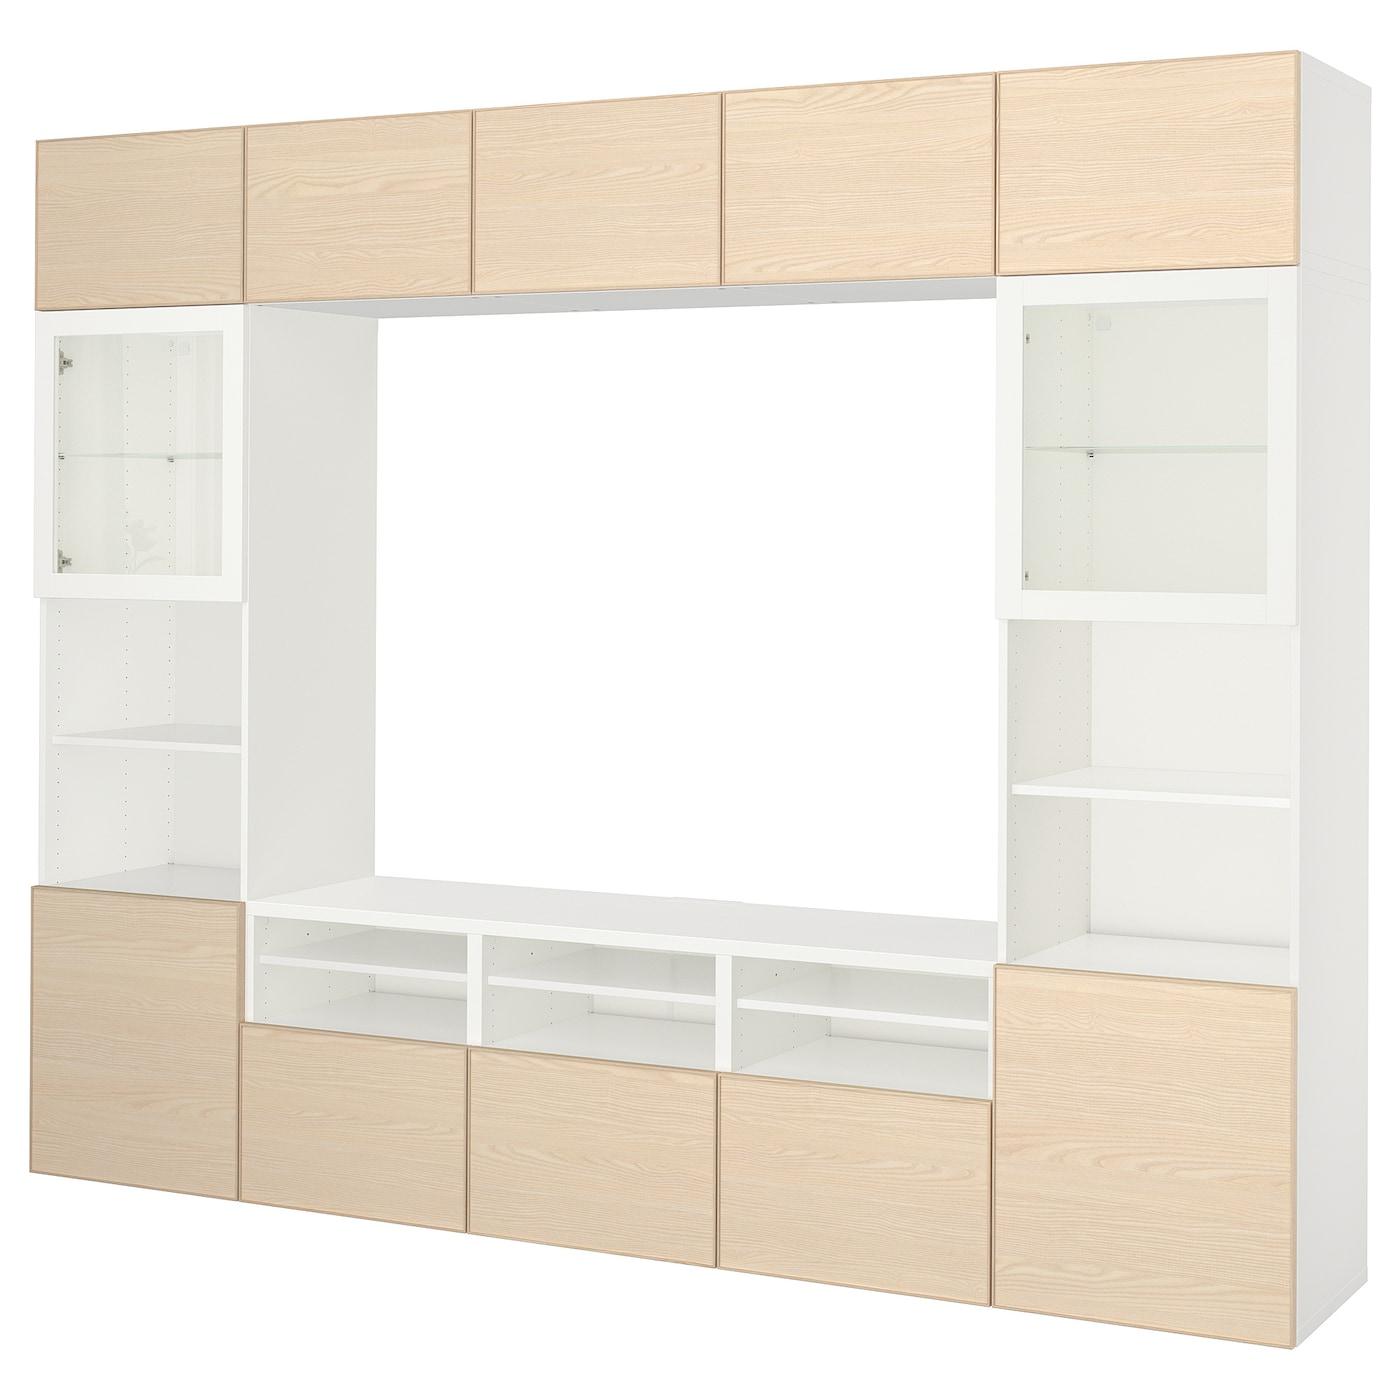 bestÅ combinaison rangt tv/vitrines blanc/inviken plaqué frêne 300 x